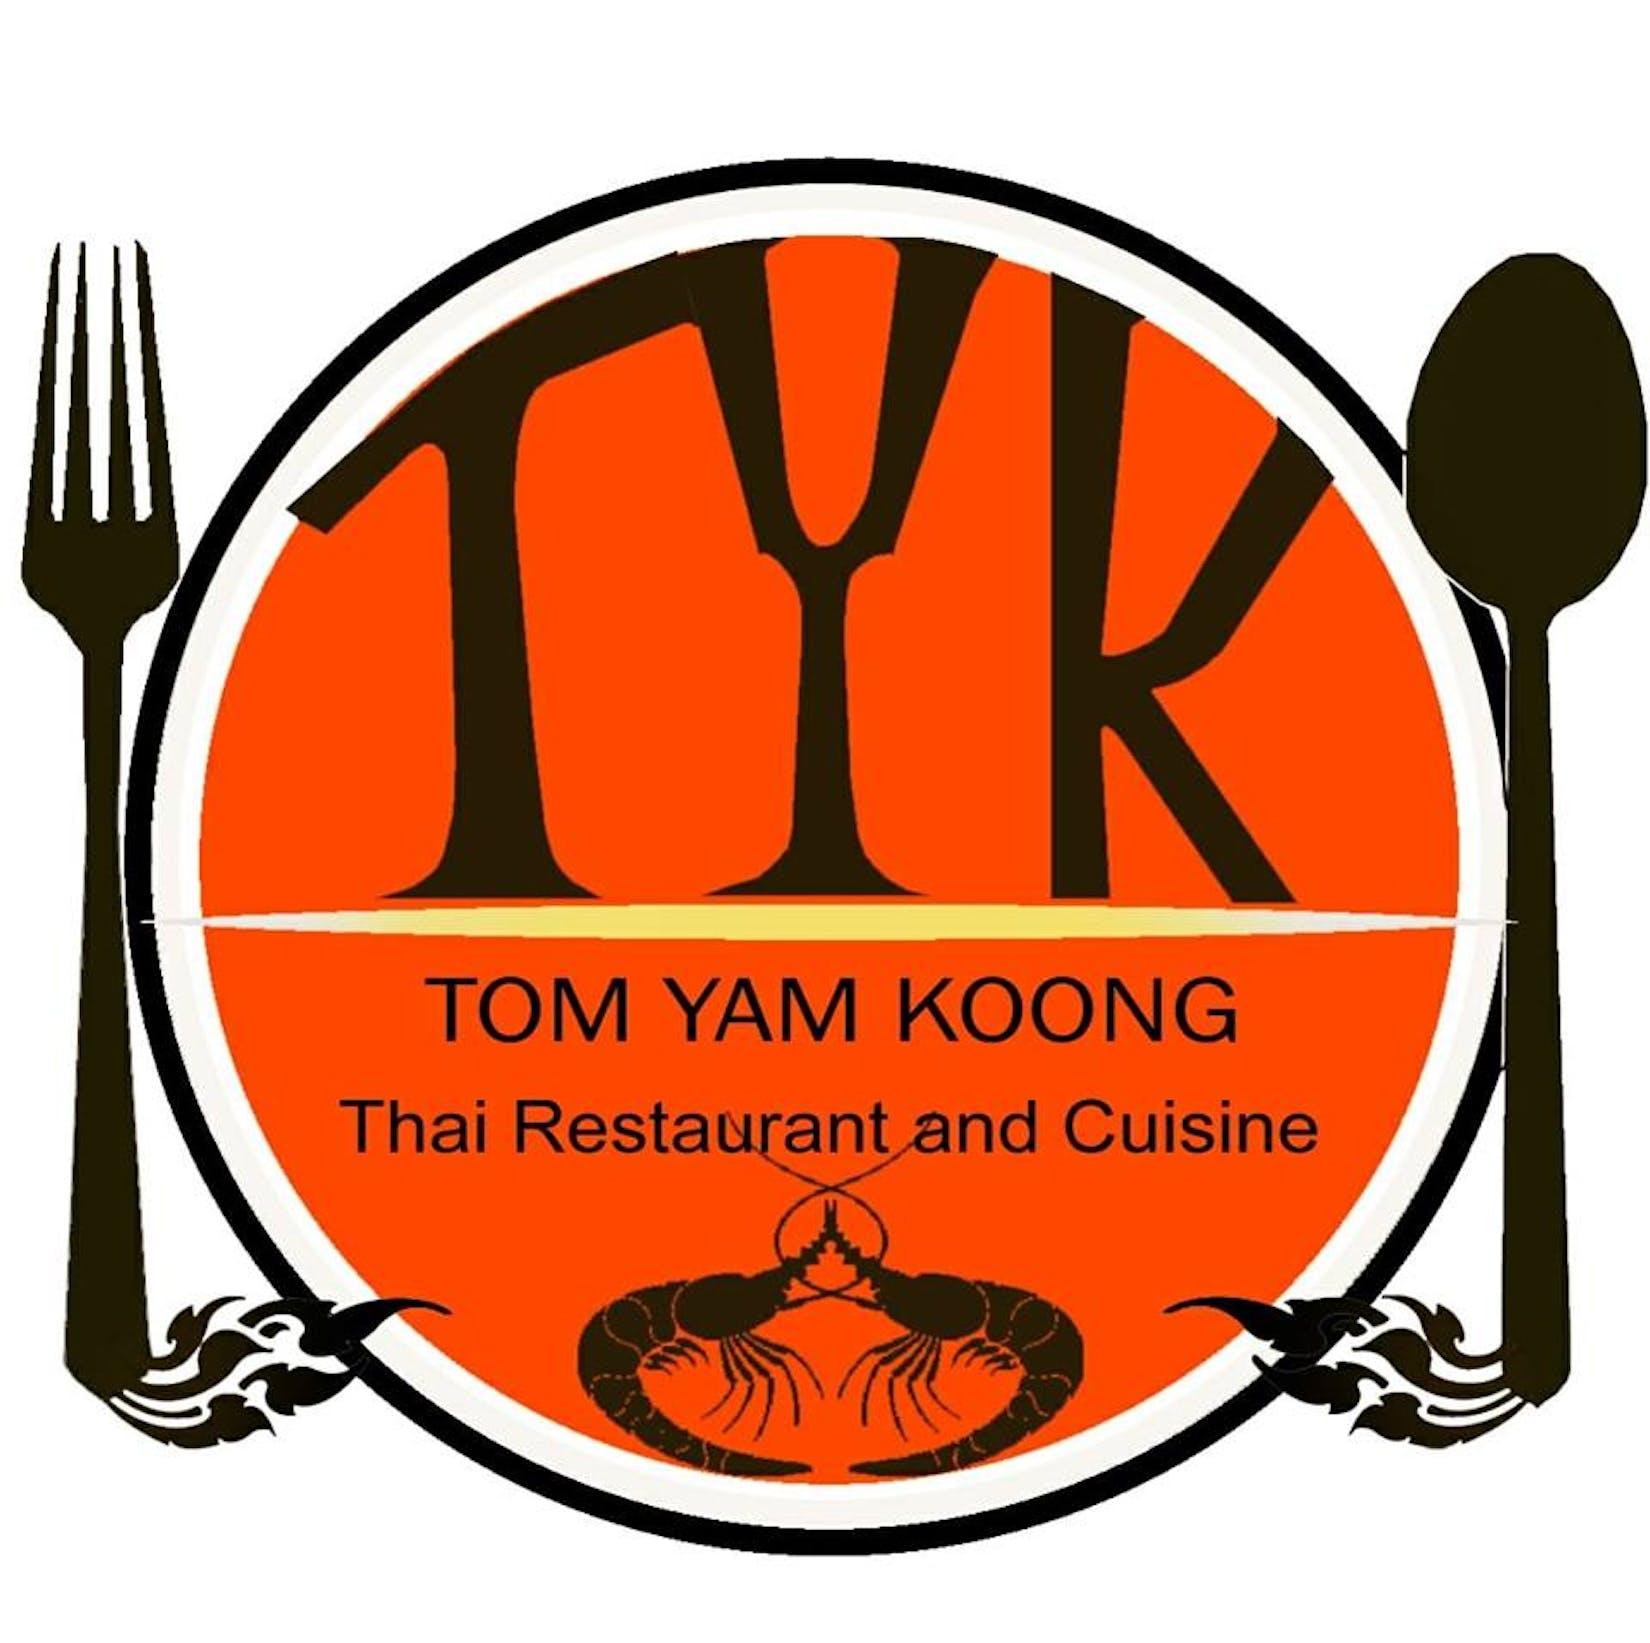 Tom Yam Koong 《Thai Food 》 | yathar